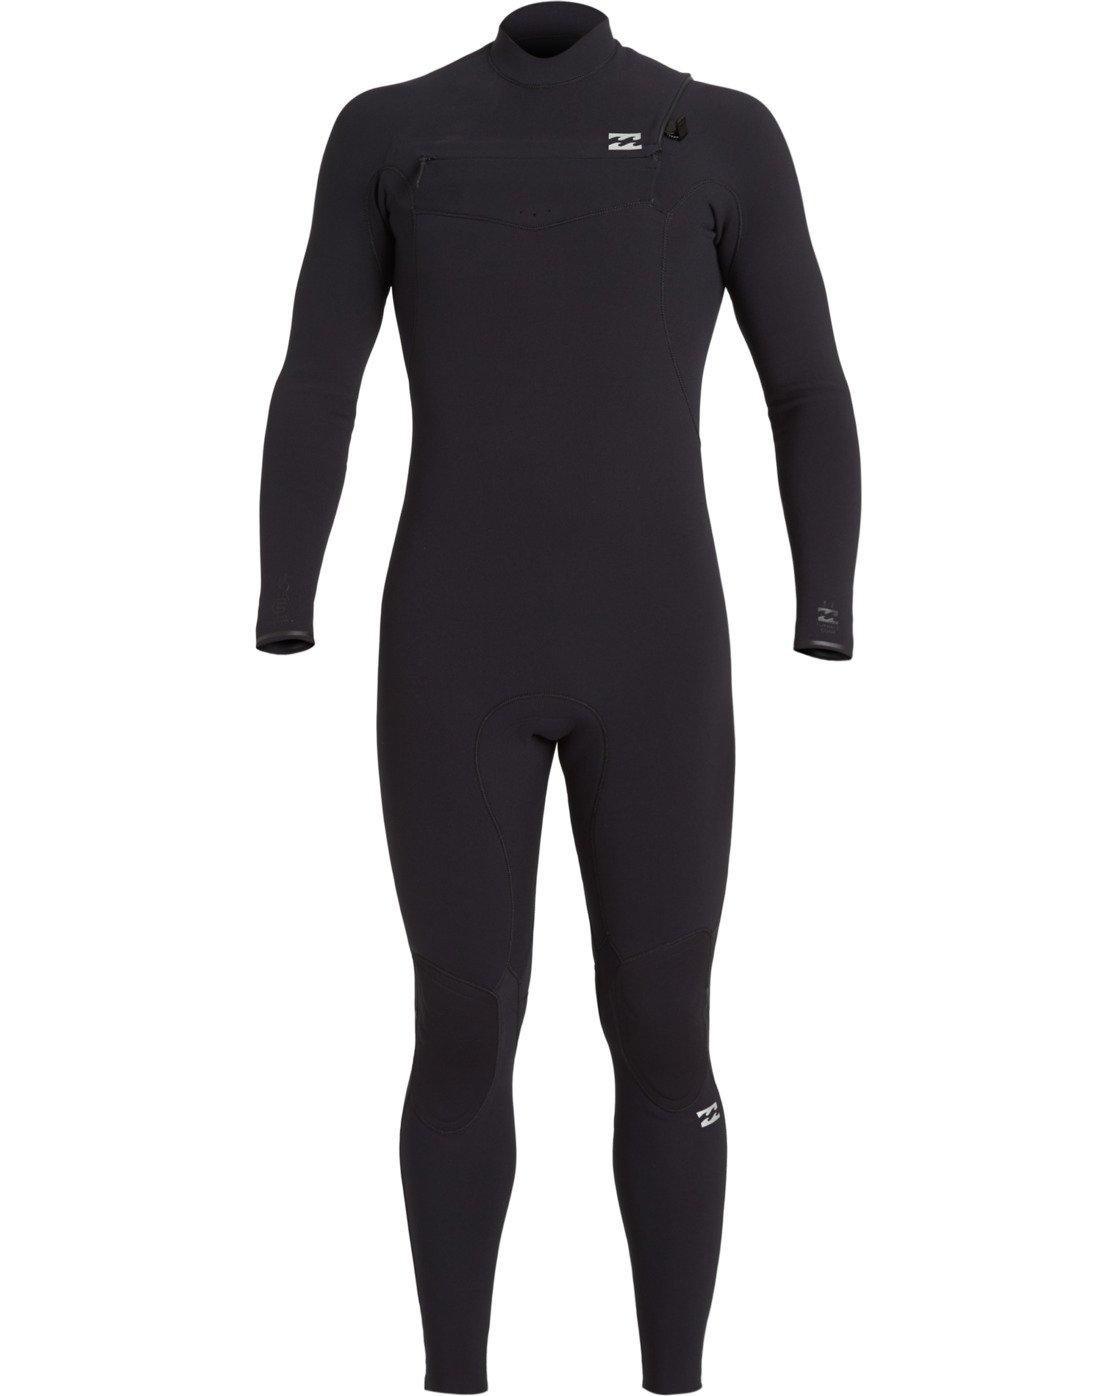 Billabong Boys Foil 3//2 Back Zip Sealed Seam Full Wetsuit